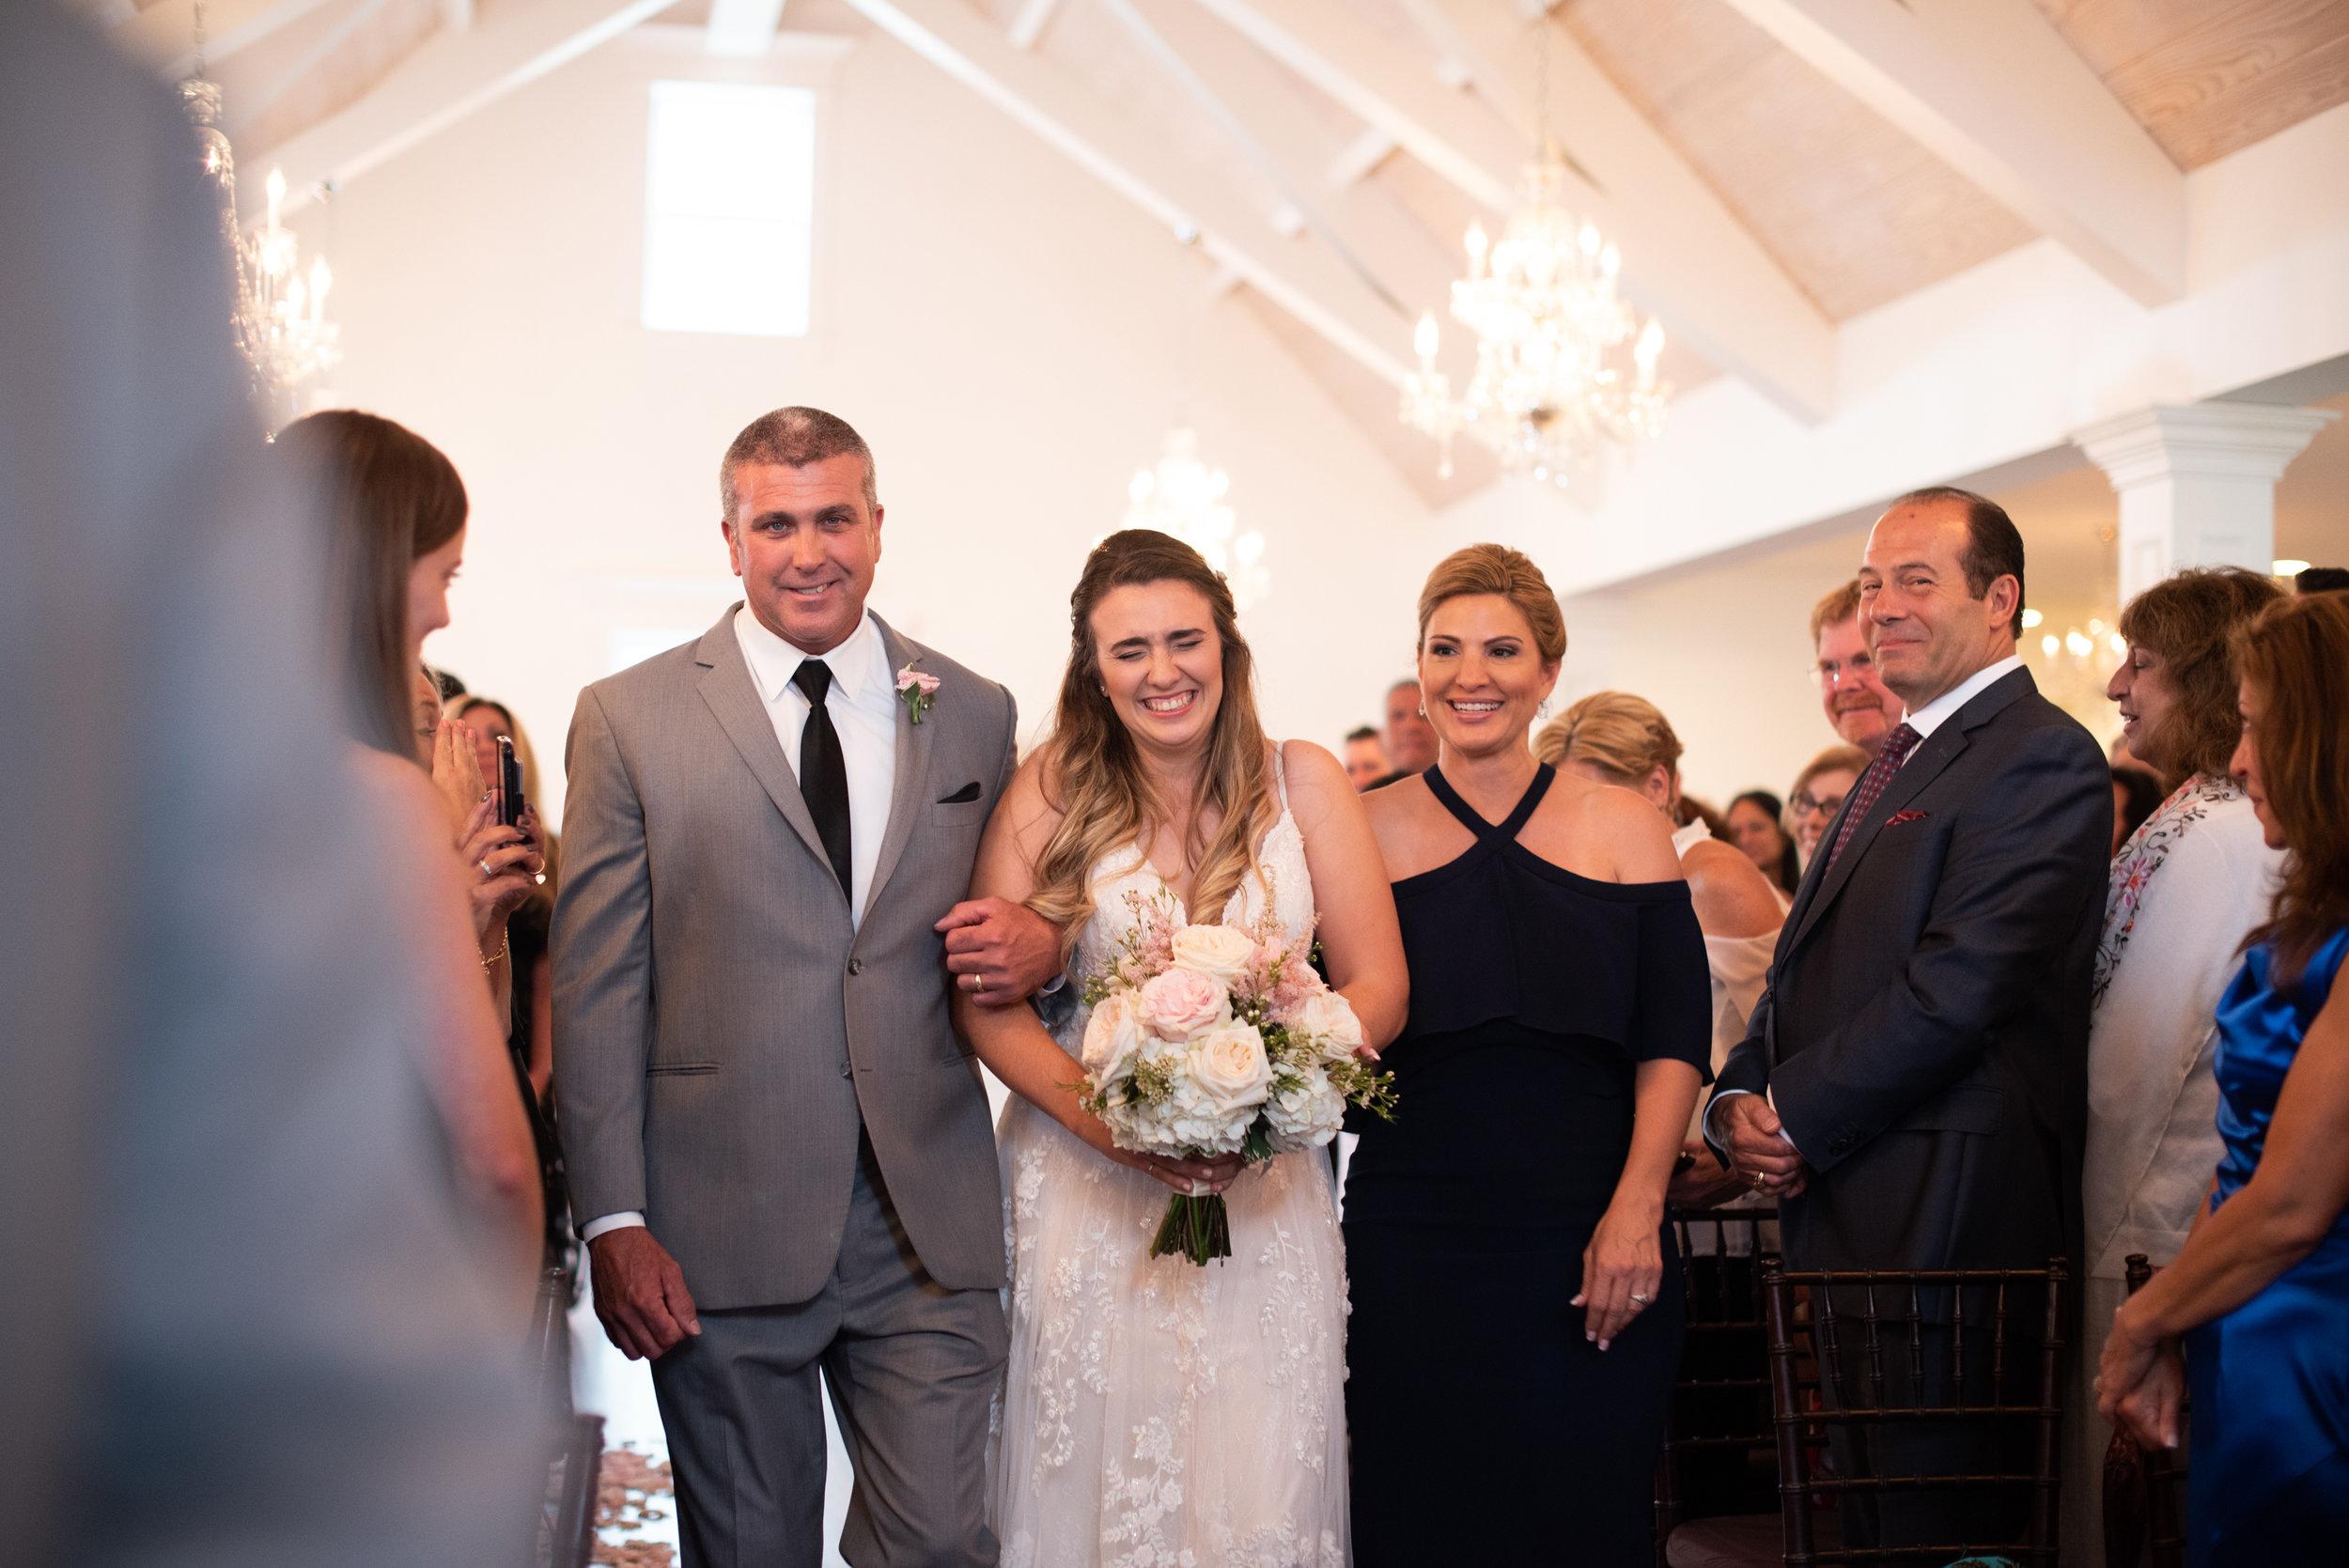 st-augustine-photographer-st-augustine-gay-wedding-sam-sex-wedding-photographer-sarah-annay-photography-white-room-weddings-27.jpg